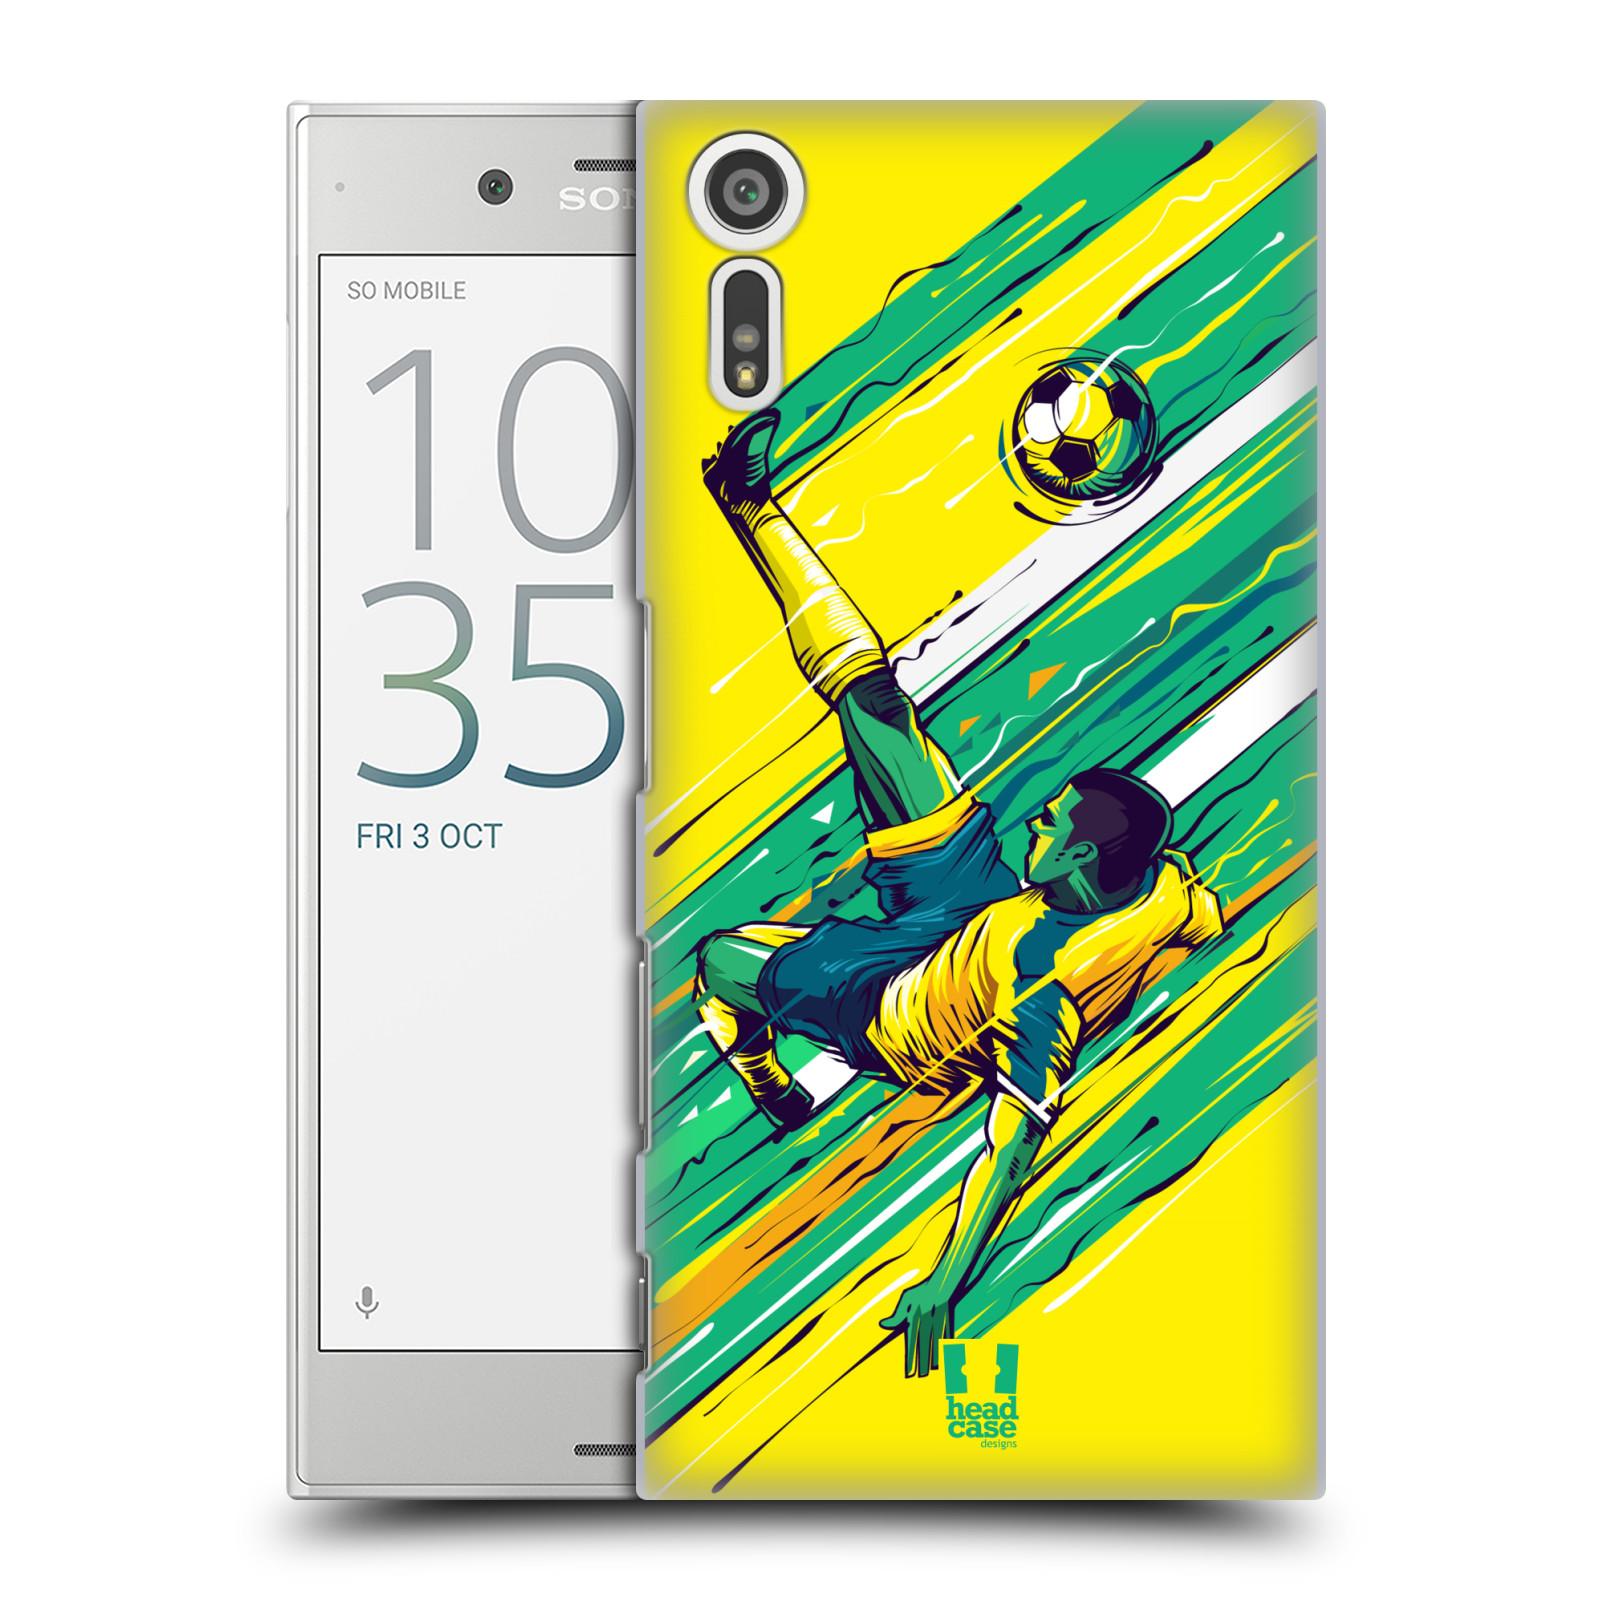 HEAD CASE plastový obal na mobil Sony Xperia XZ Sport fotbal kreslený nůžky